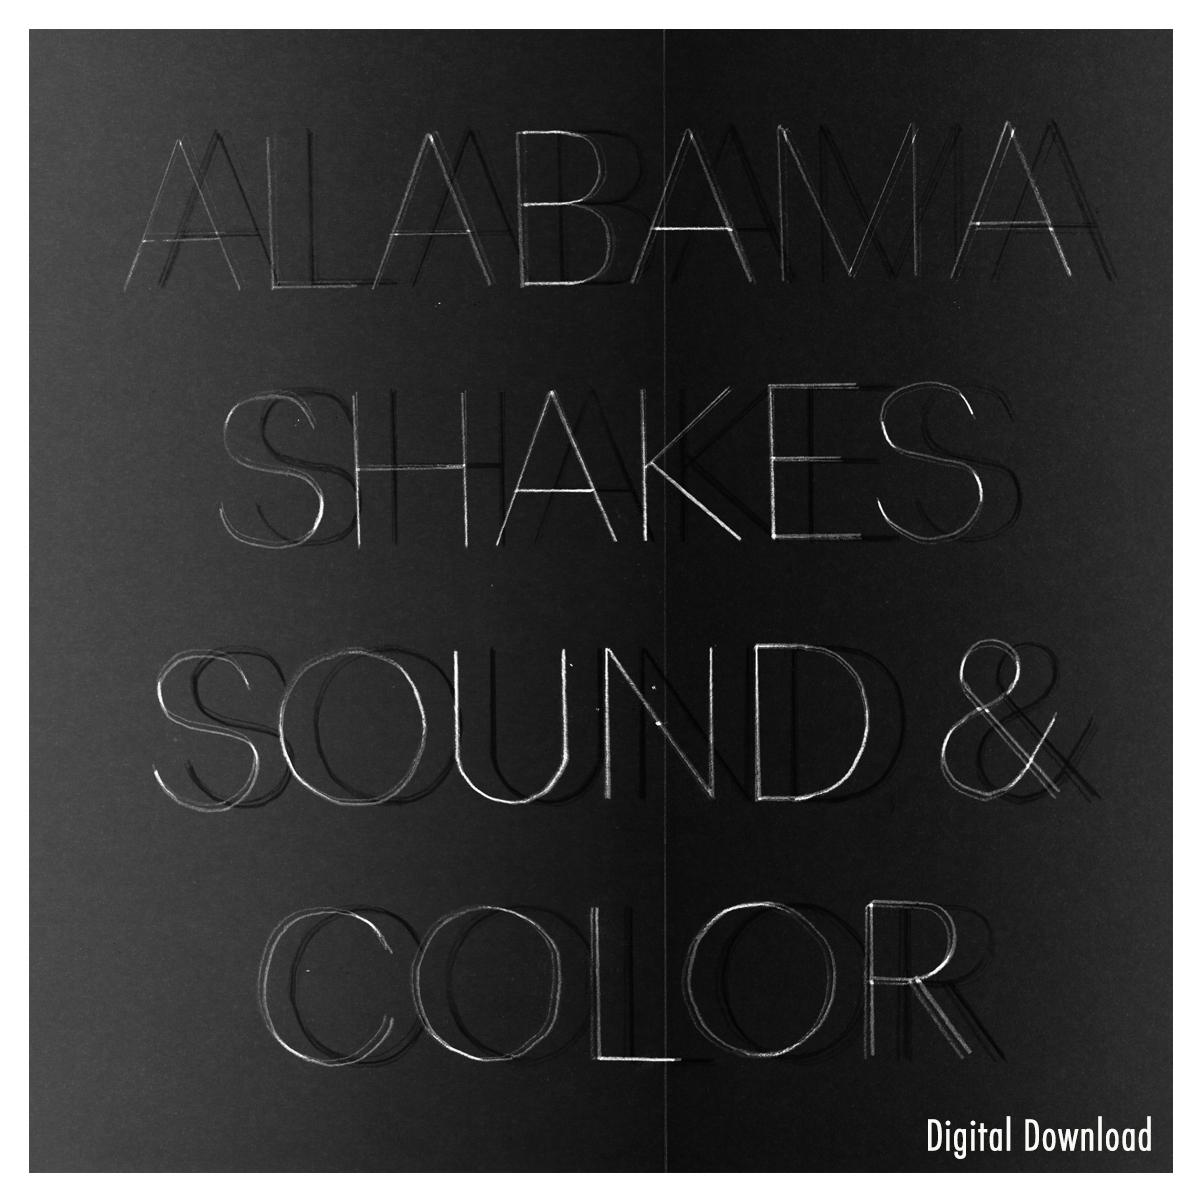 "Alabama Shakes - ""Sound & Color"" Digital Download (MP3 or FLAC)"